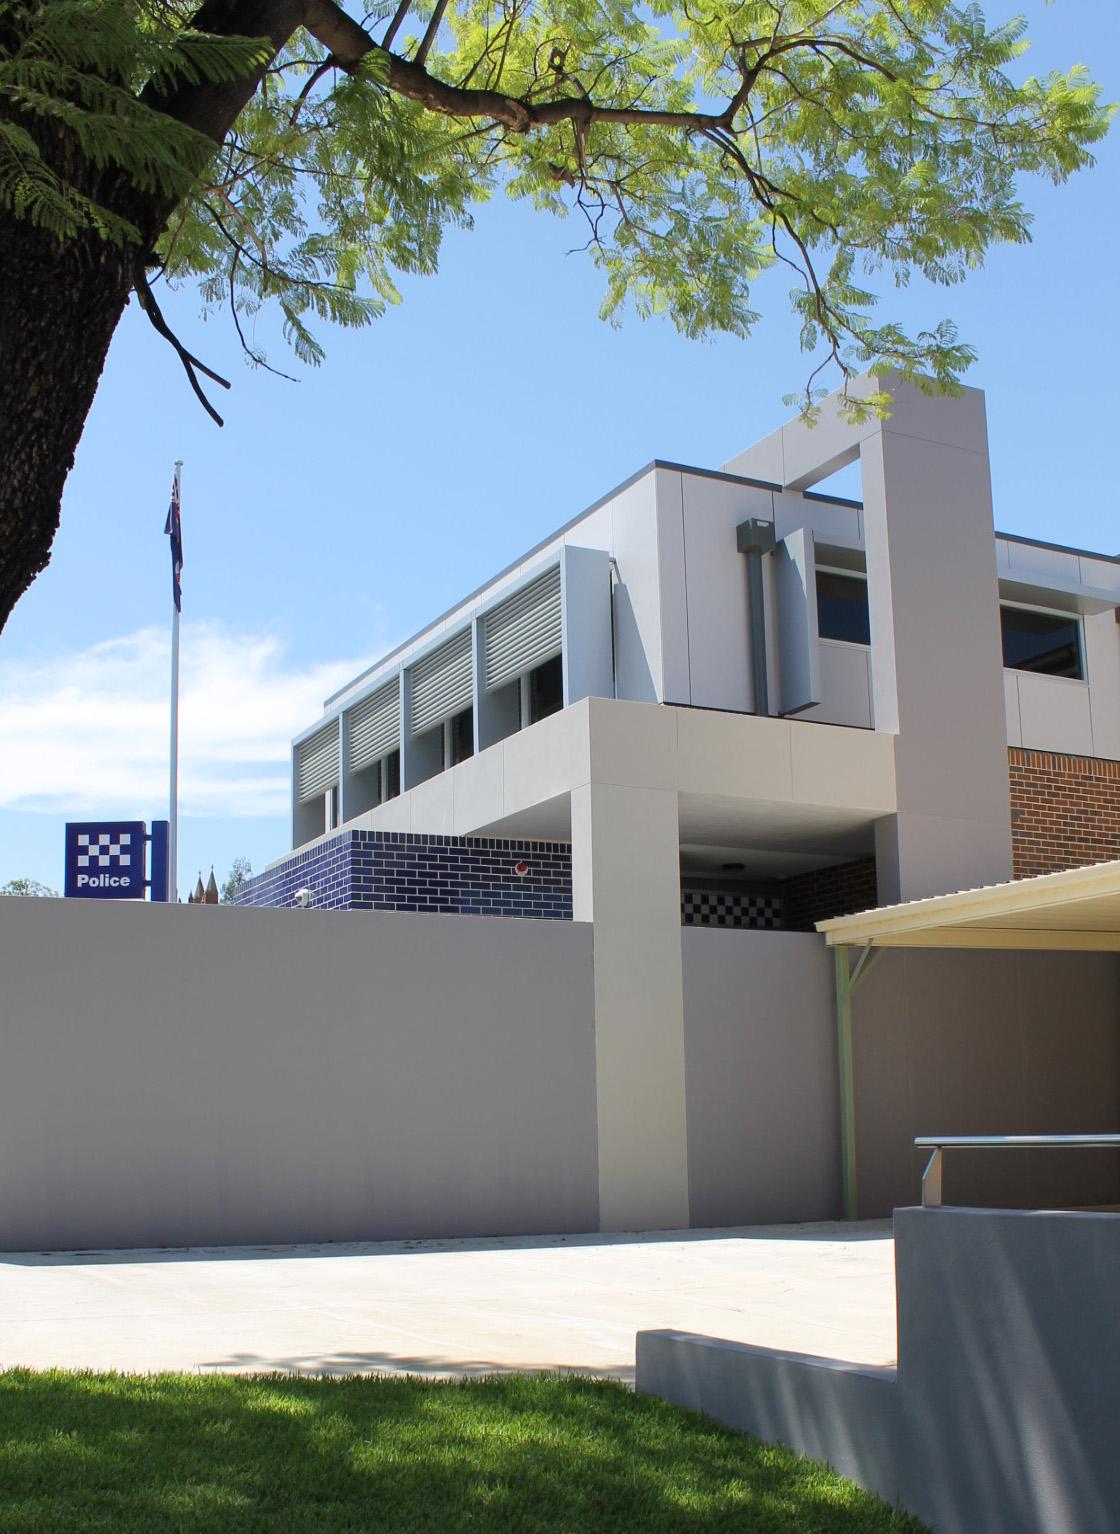 Parkes Police Station Exterior Architecture – Gardner Wetherill GW 2